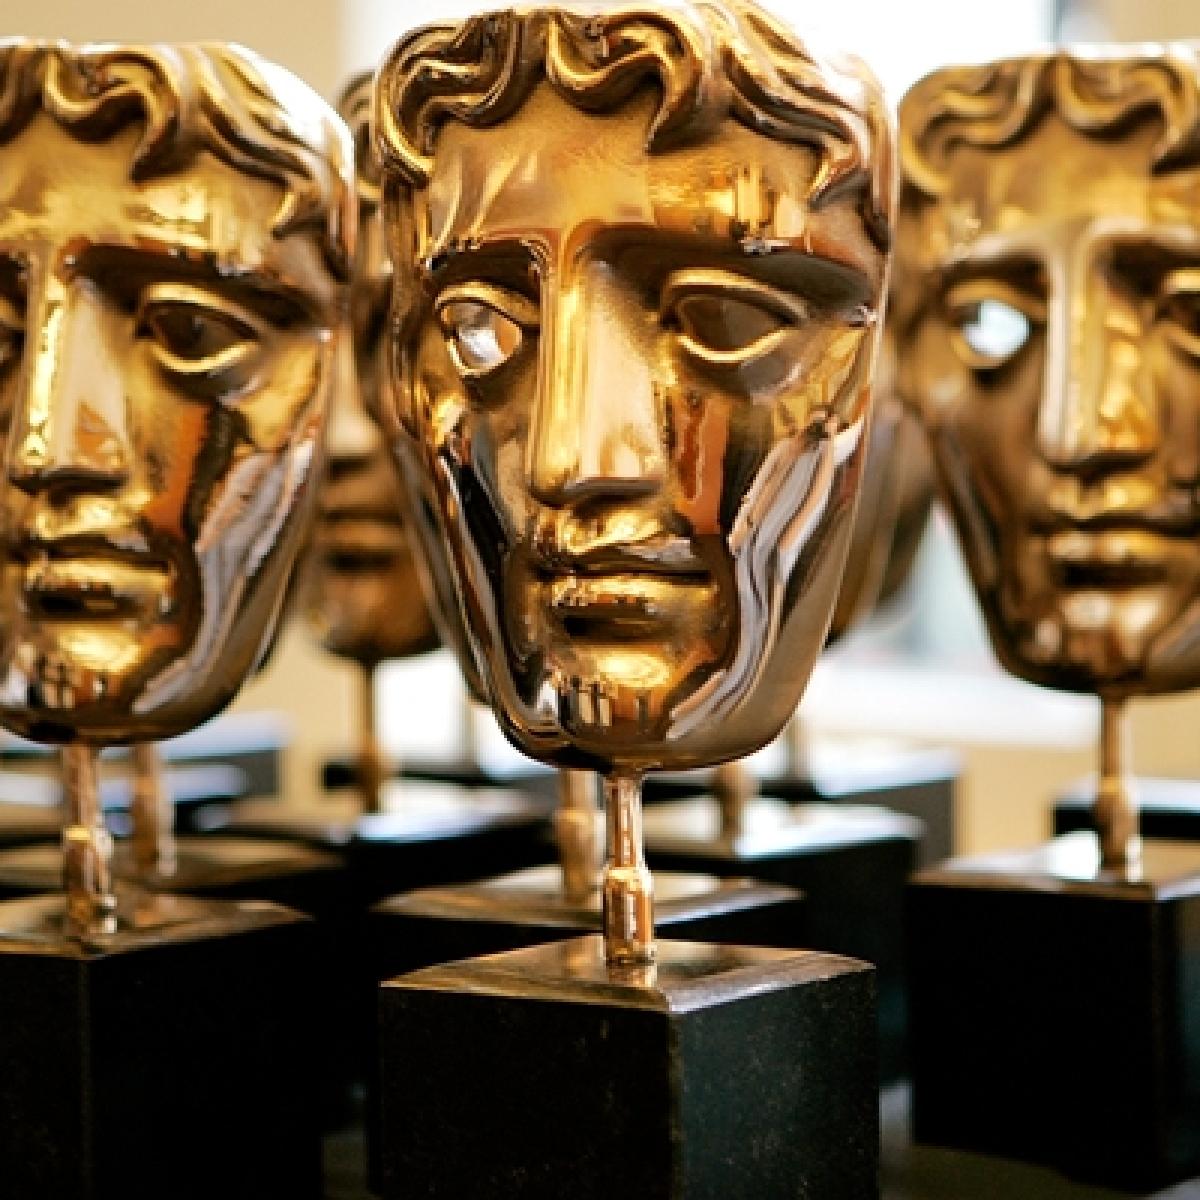 BAFTA Awards 2021: 'Ma Rainey's Black Bottom' picks two awards - here's complete list of winners